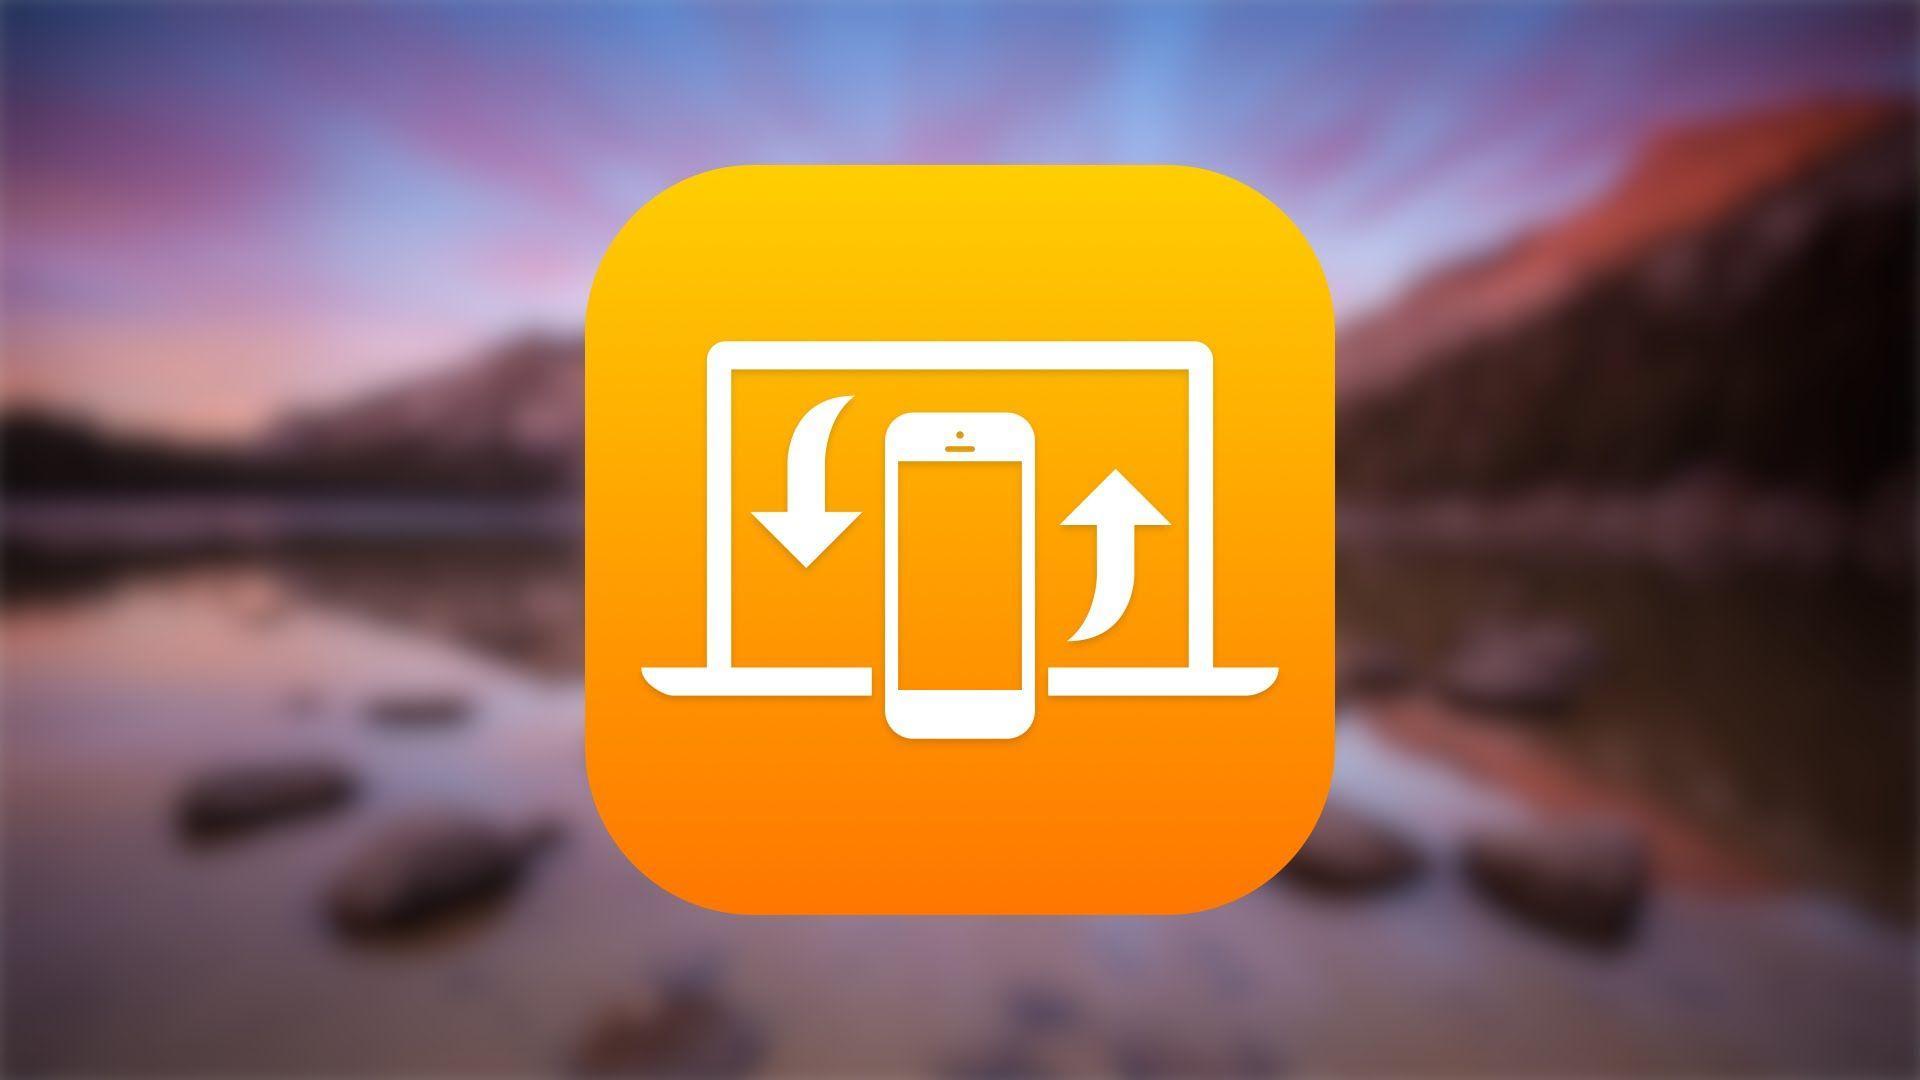 Come passare da iOS a Mac senza alcun problema grazie a Continuity